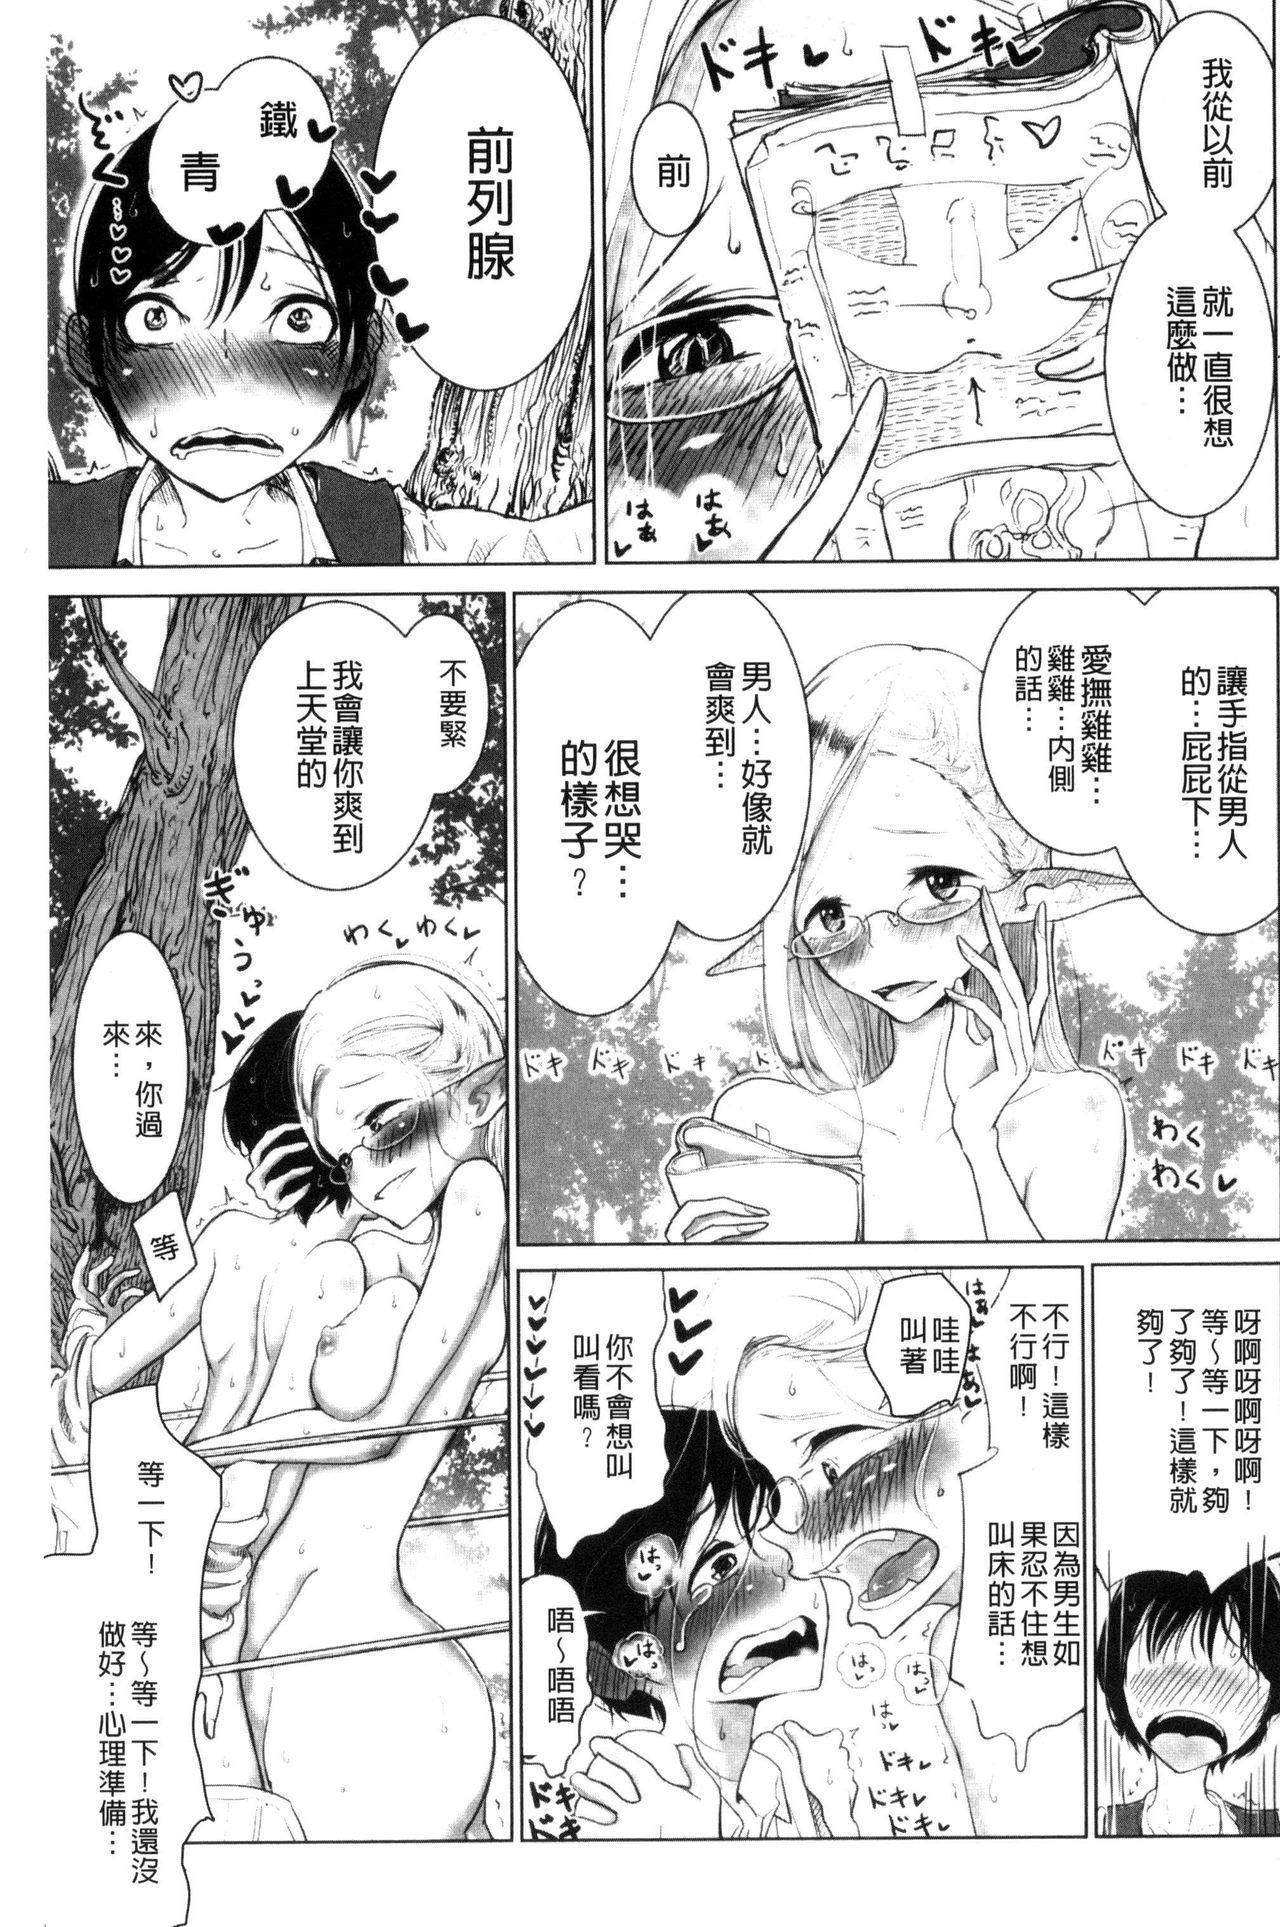 [Dhibi] Sono Yubisaki de Korogashite - Please Caress it at the Finger-tip. [Chinese] 124